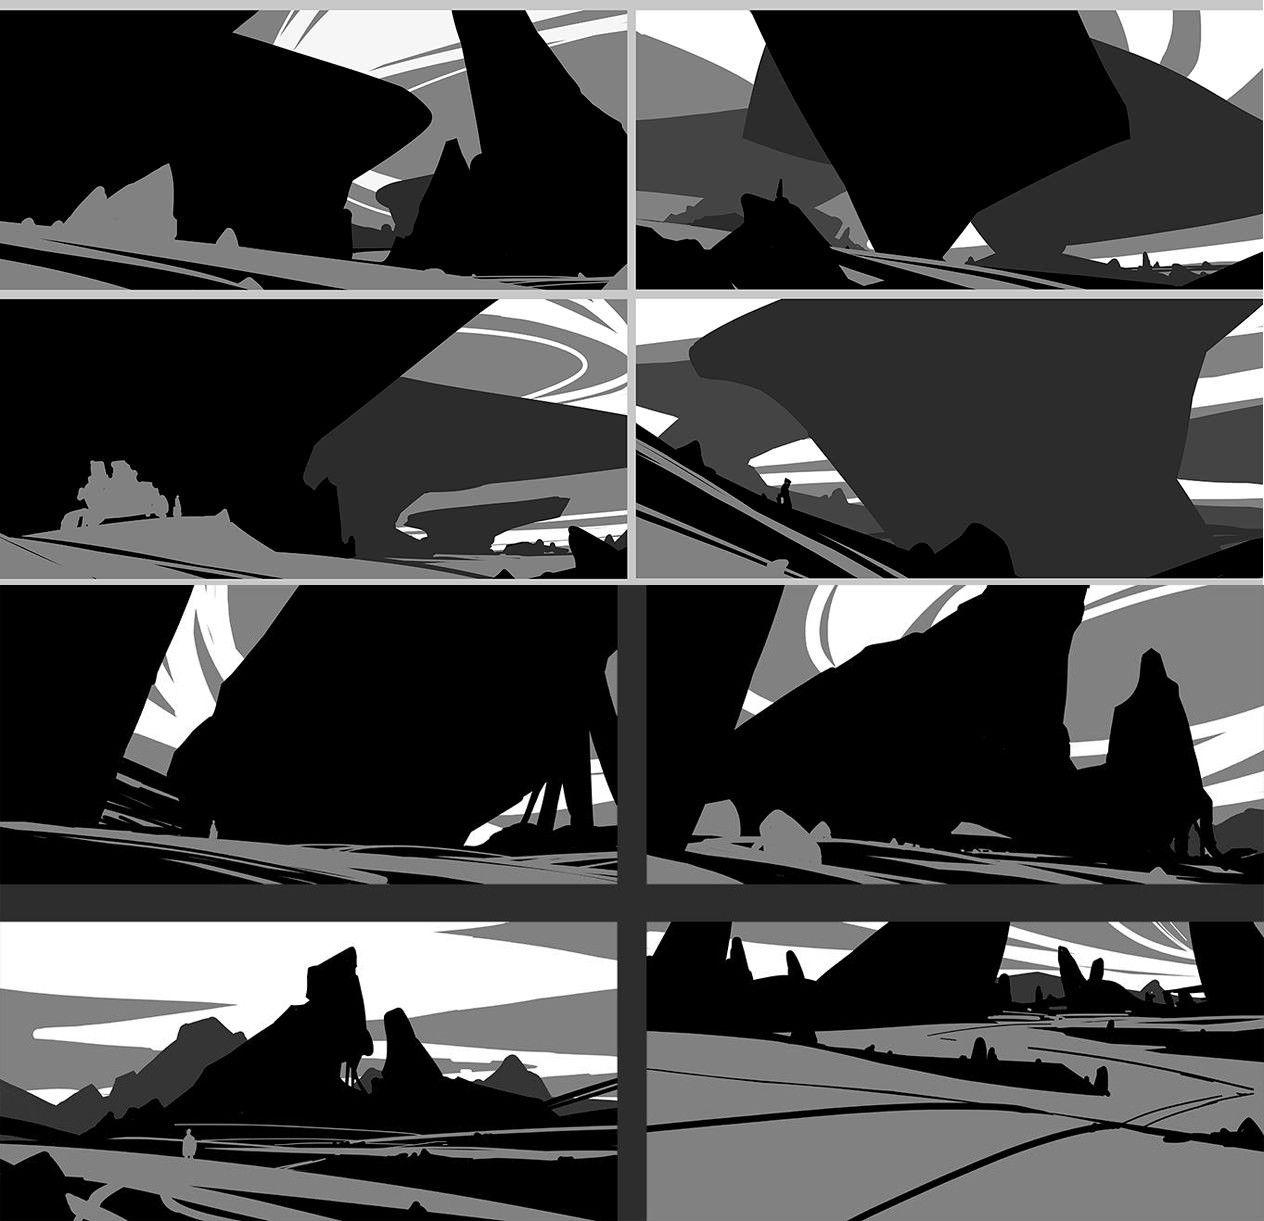 veikkasomermauntitled1.jpg (1264×1221) Environment